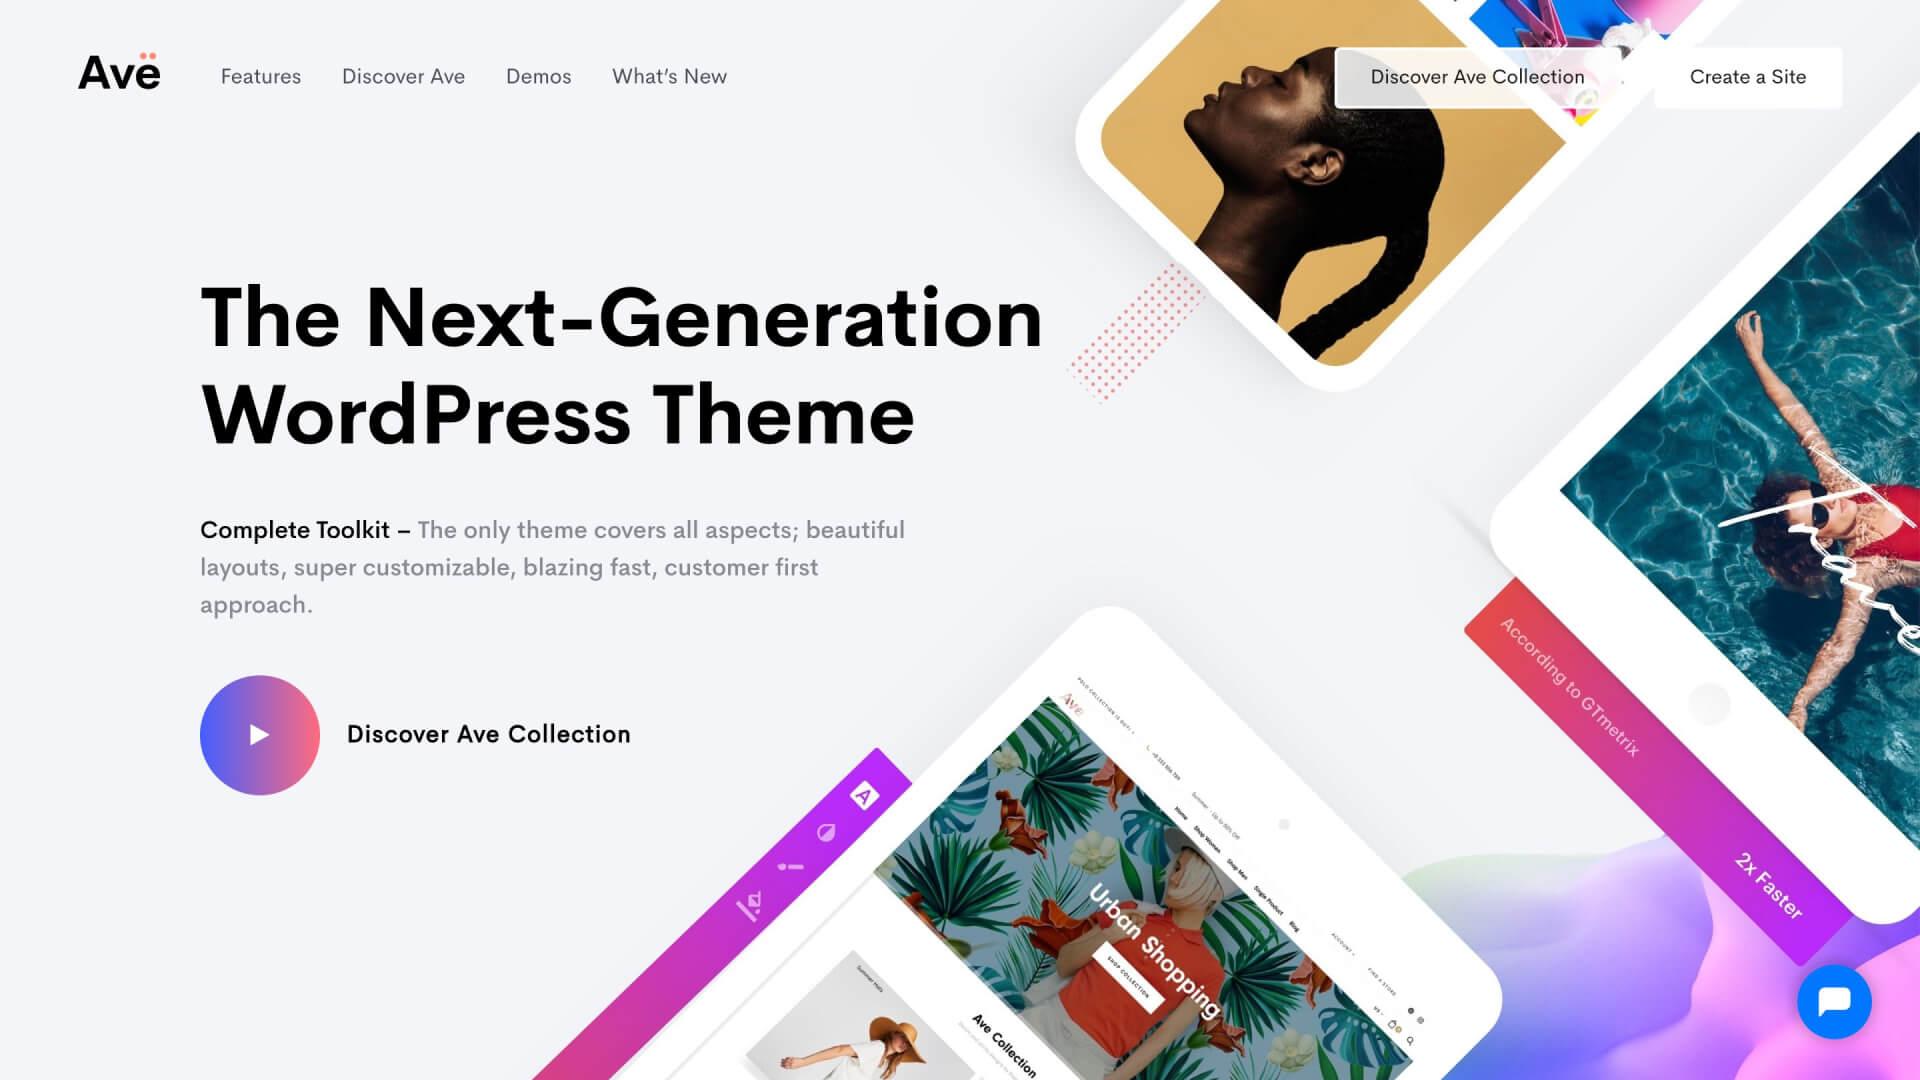 Ave WordPress Theme – The Next Generation WordPress Theme-IrvingLab 爾文實驗室